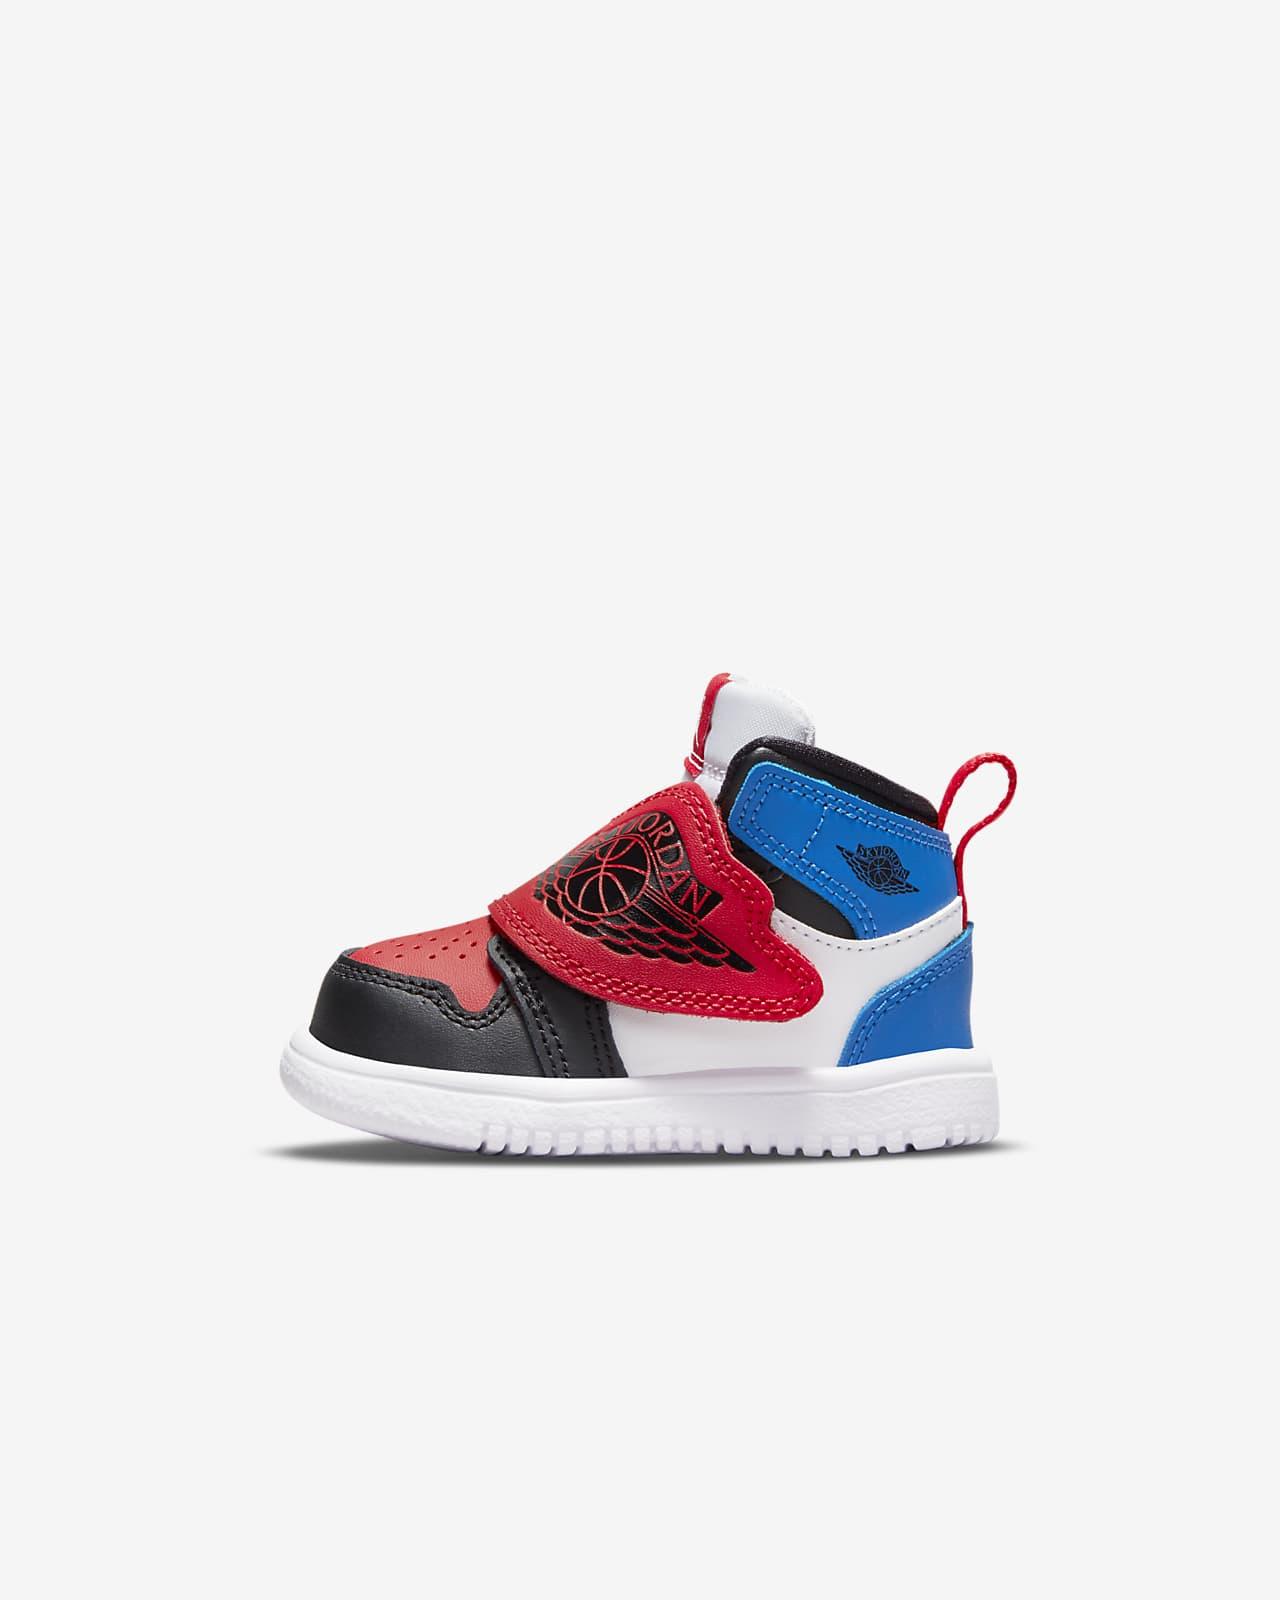 Sky Jordan 1 Baby and Toddler Shoe